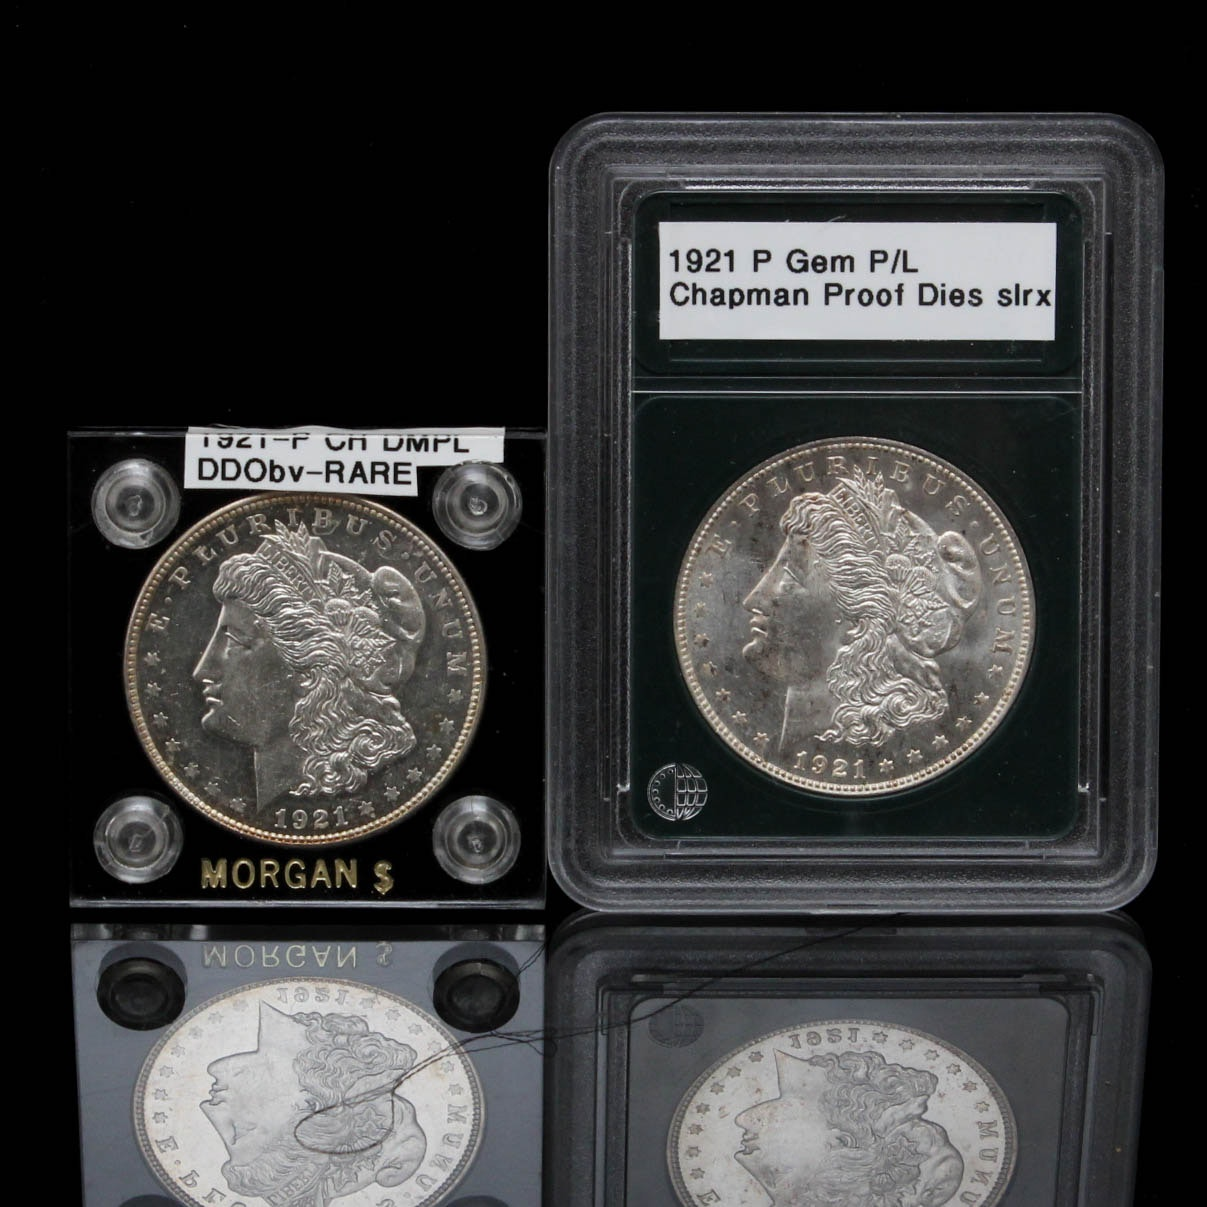 Two 1921 Mogan Silver Dollar Coins